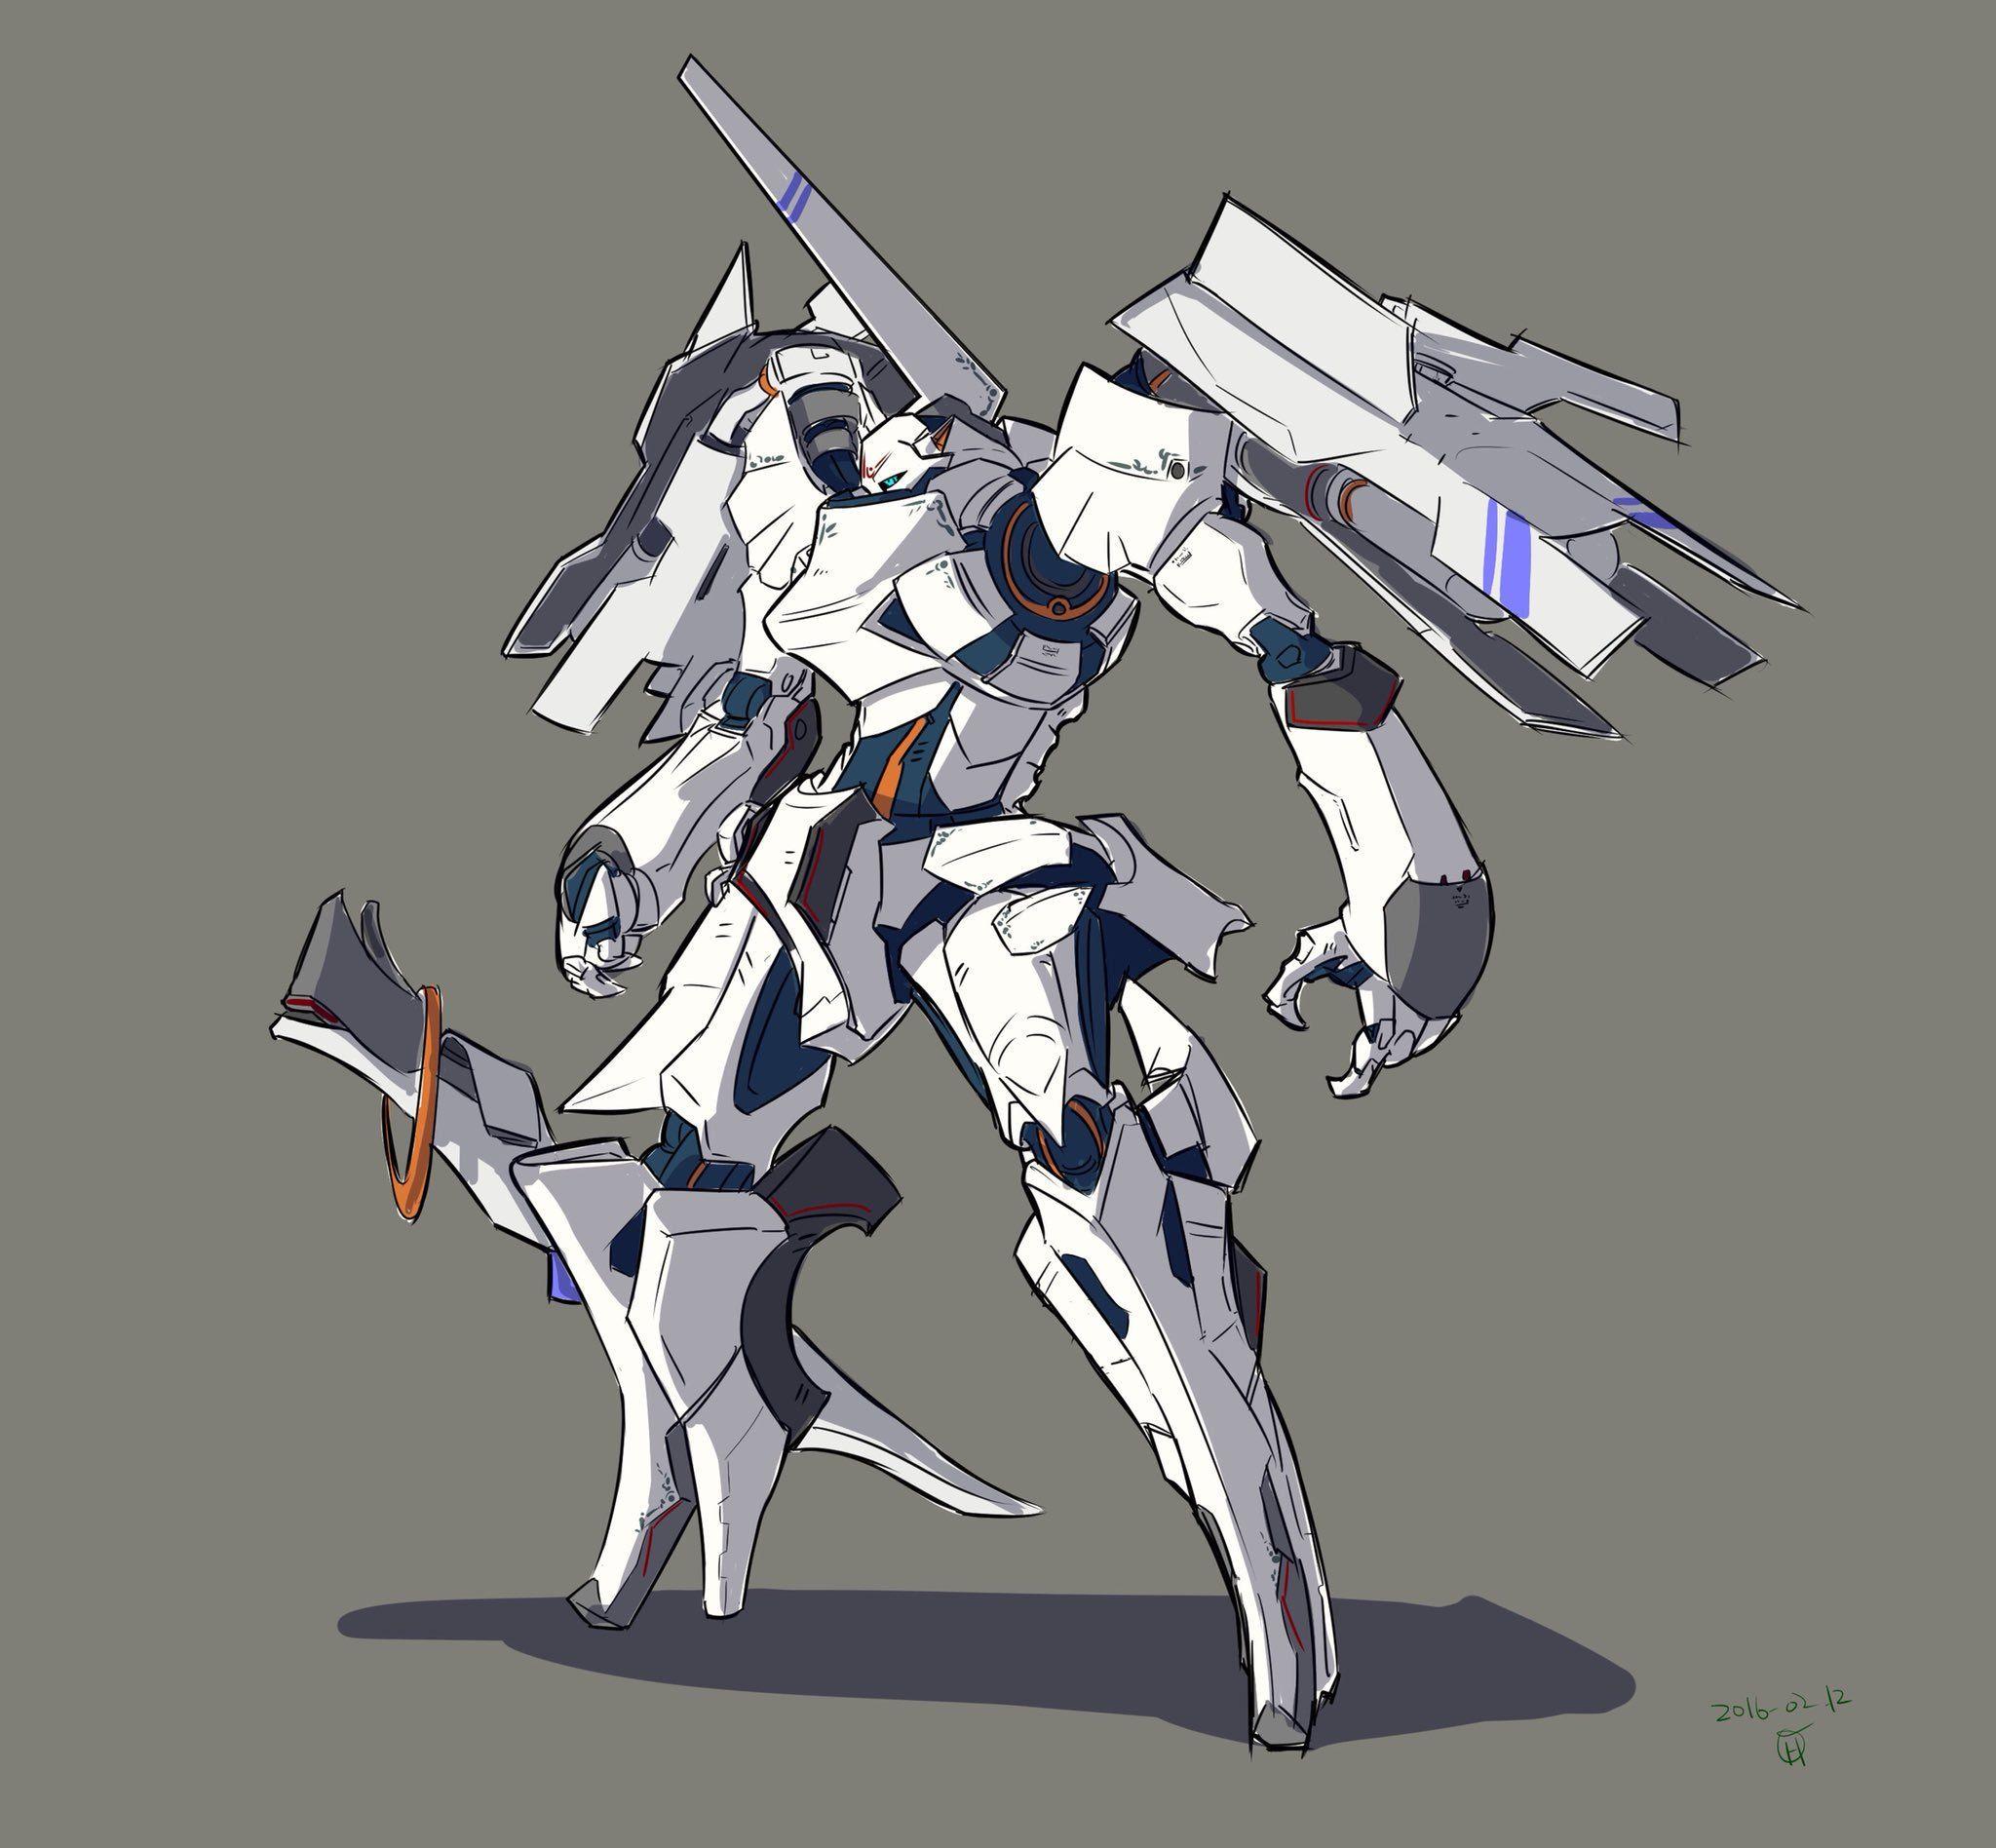 moi on twitter futuristic art robot art concept art characters